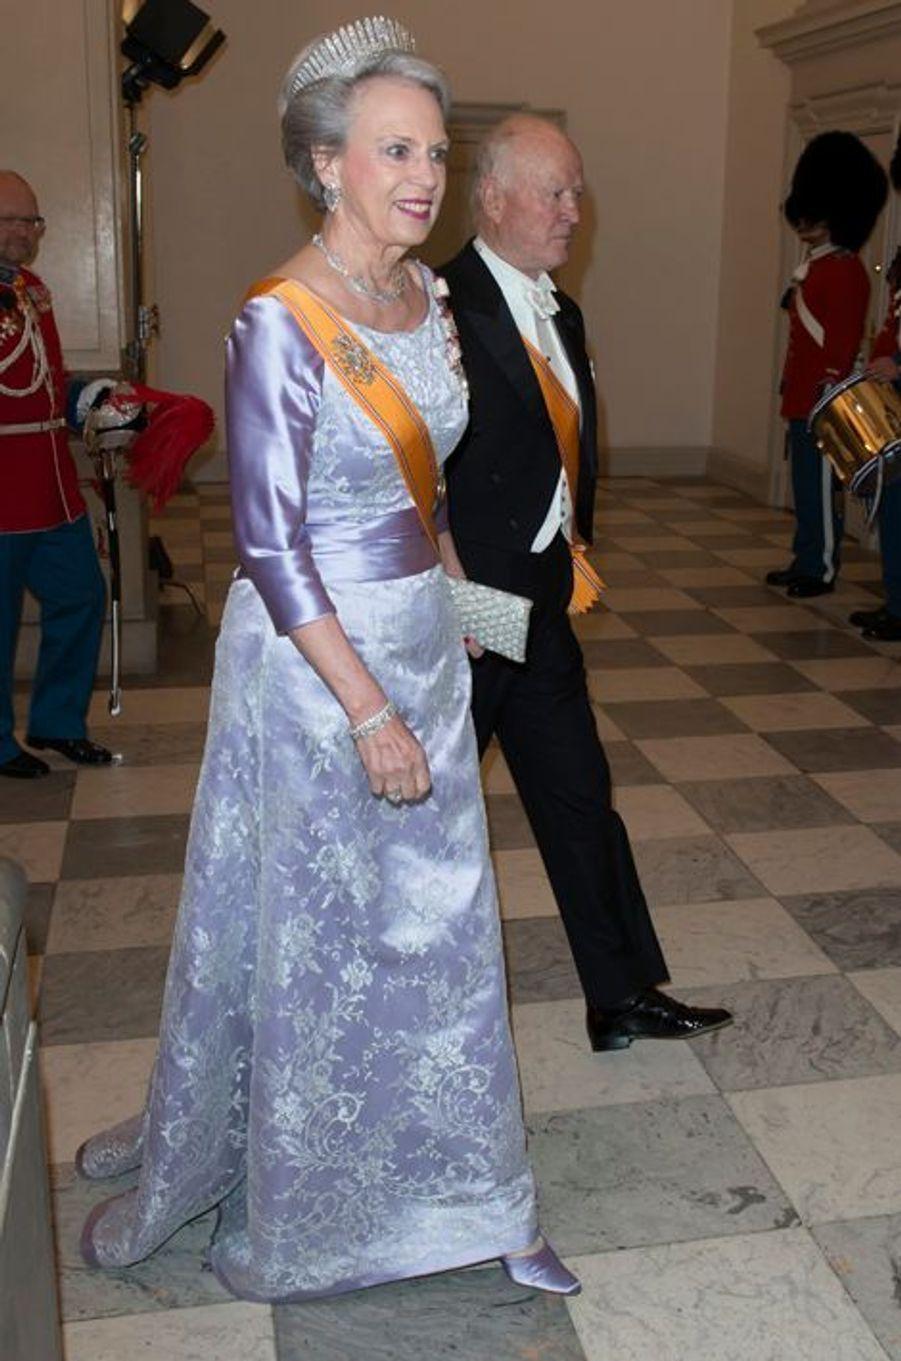 La princesse Benedikte de Danemark et son mari le prince Richard de Sayn-Wittgenstein-Berleburg à Copenhague, le 17 mars 2015